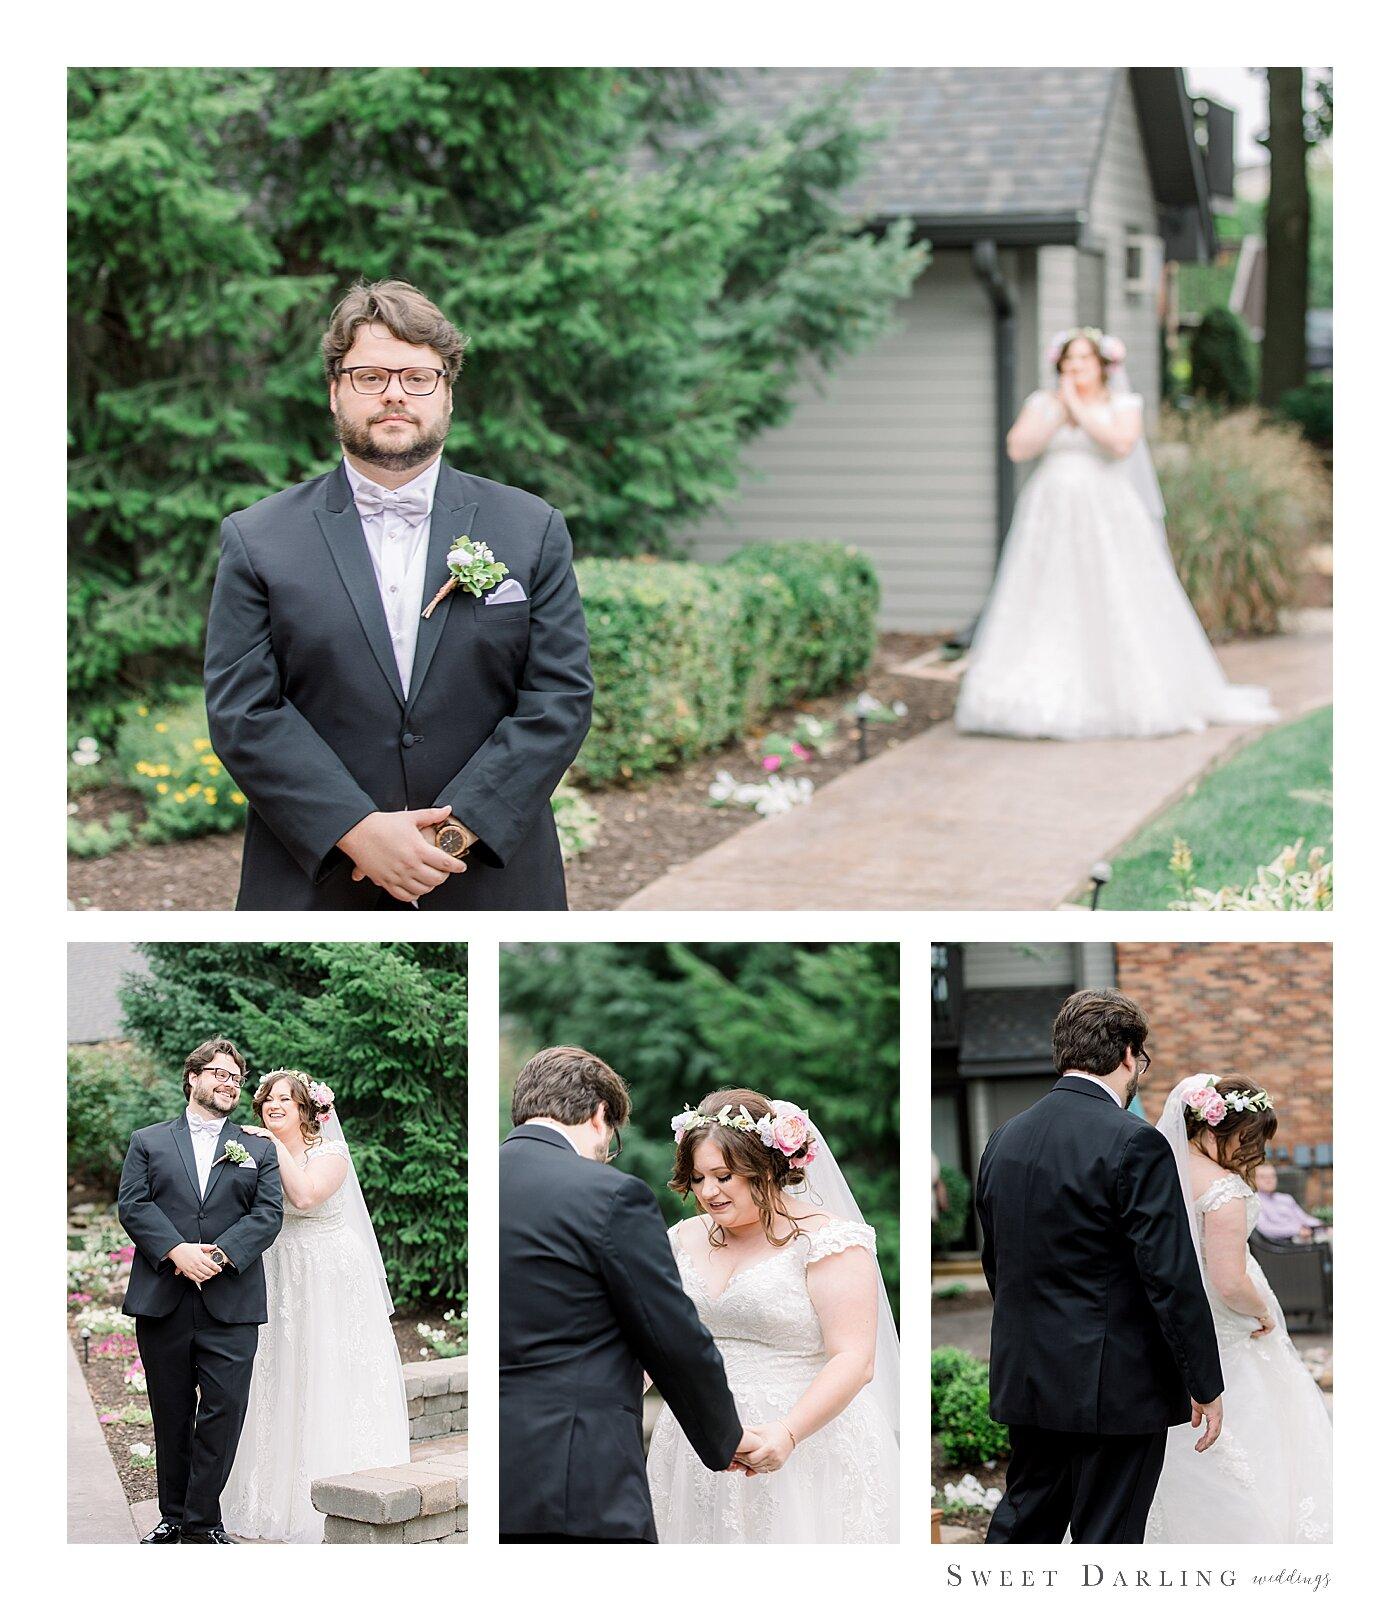 Bloomington-Normal-IL-Wedding-Photographer-eastland-suites-hotel_0012.jpg